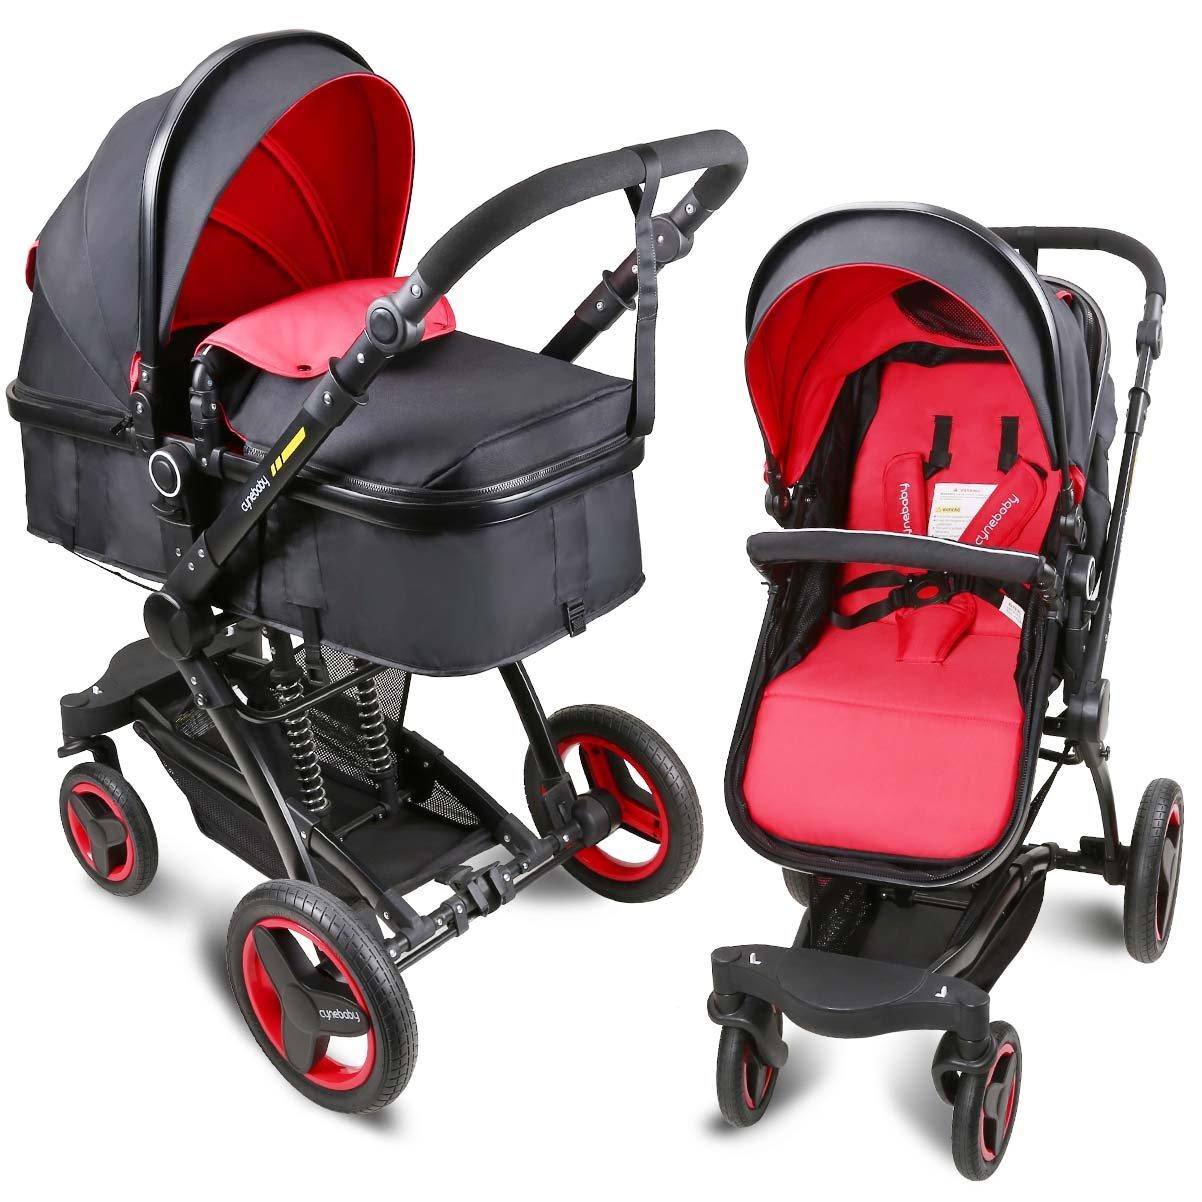 Infant Toddler Baby Stroller Newborn Baby Carriage Folding Pram Stroller Luxury Pushchair Stroller High Landscape (red)